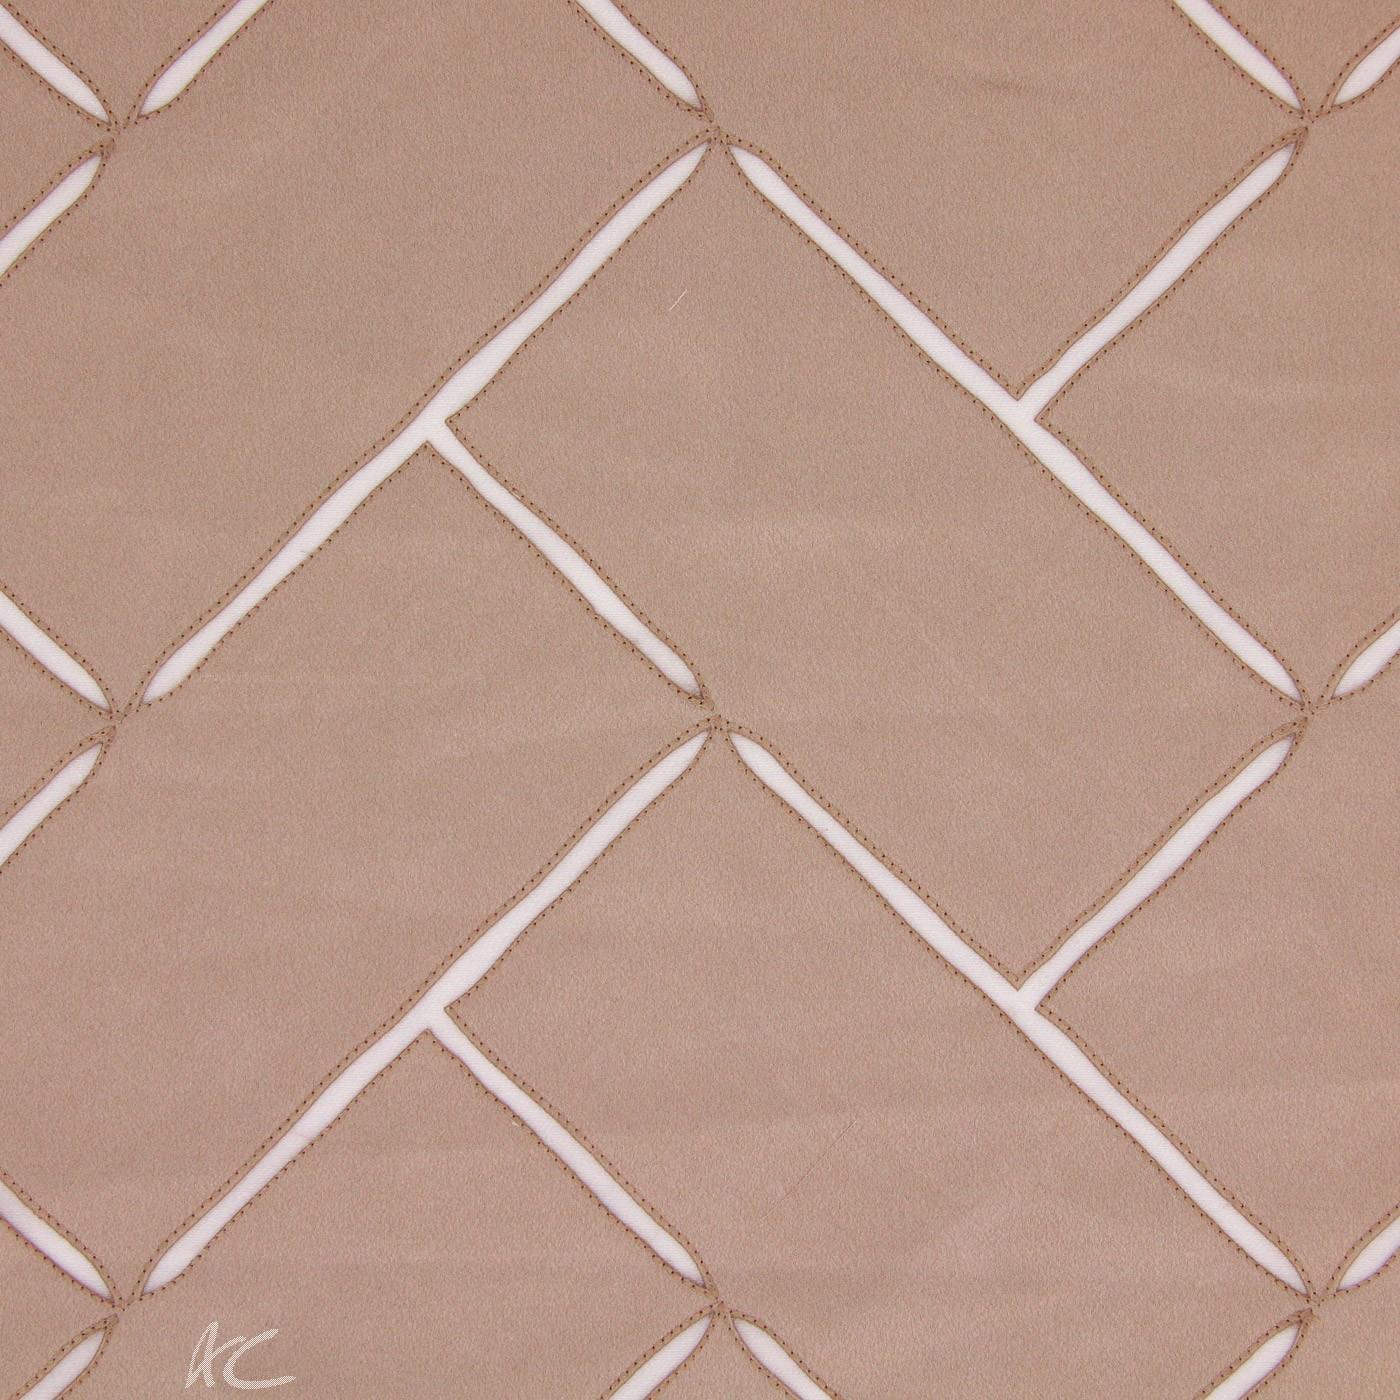 Prestigious Textiles Tanomah Aslan Camel Cushion Covers